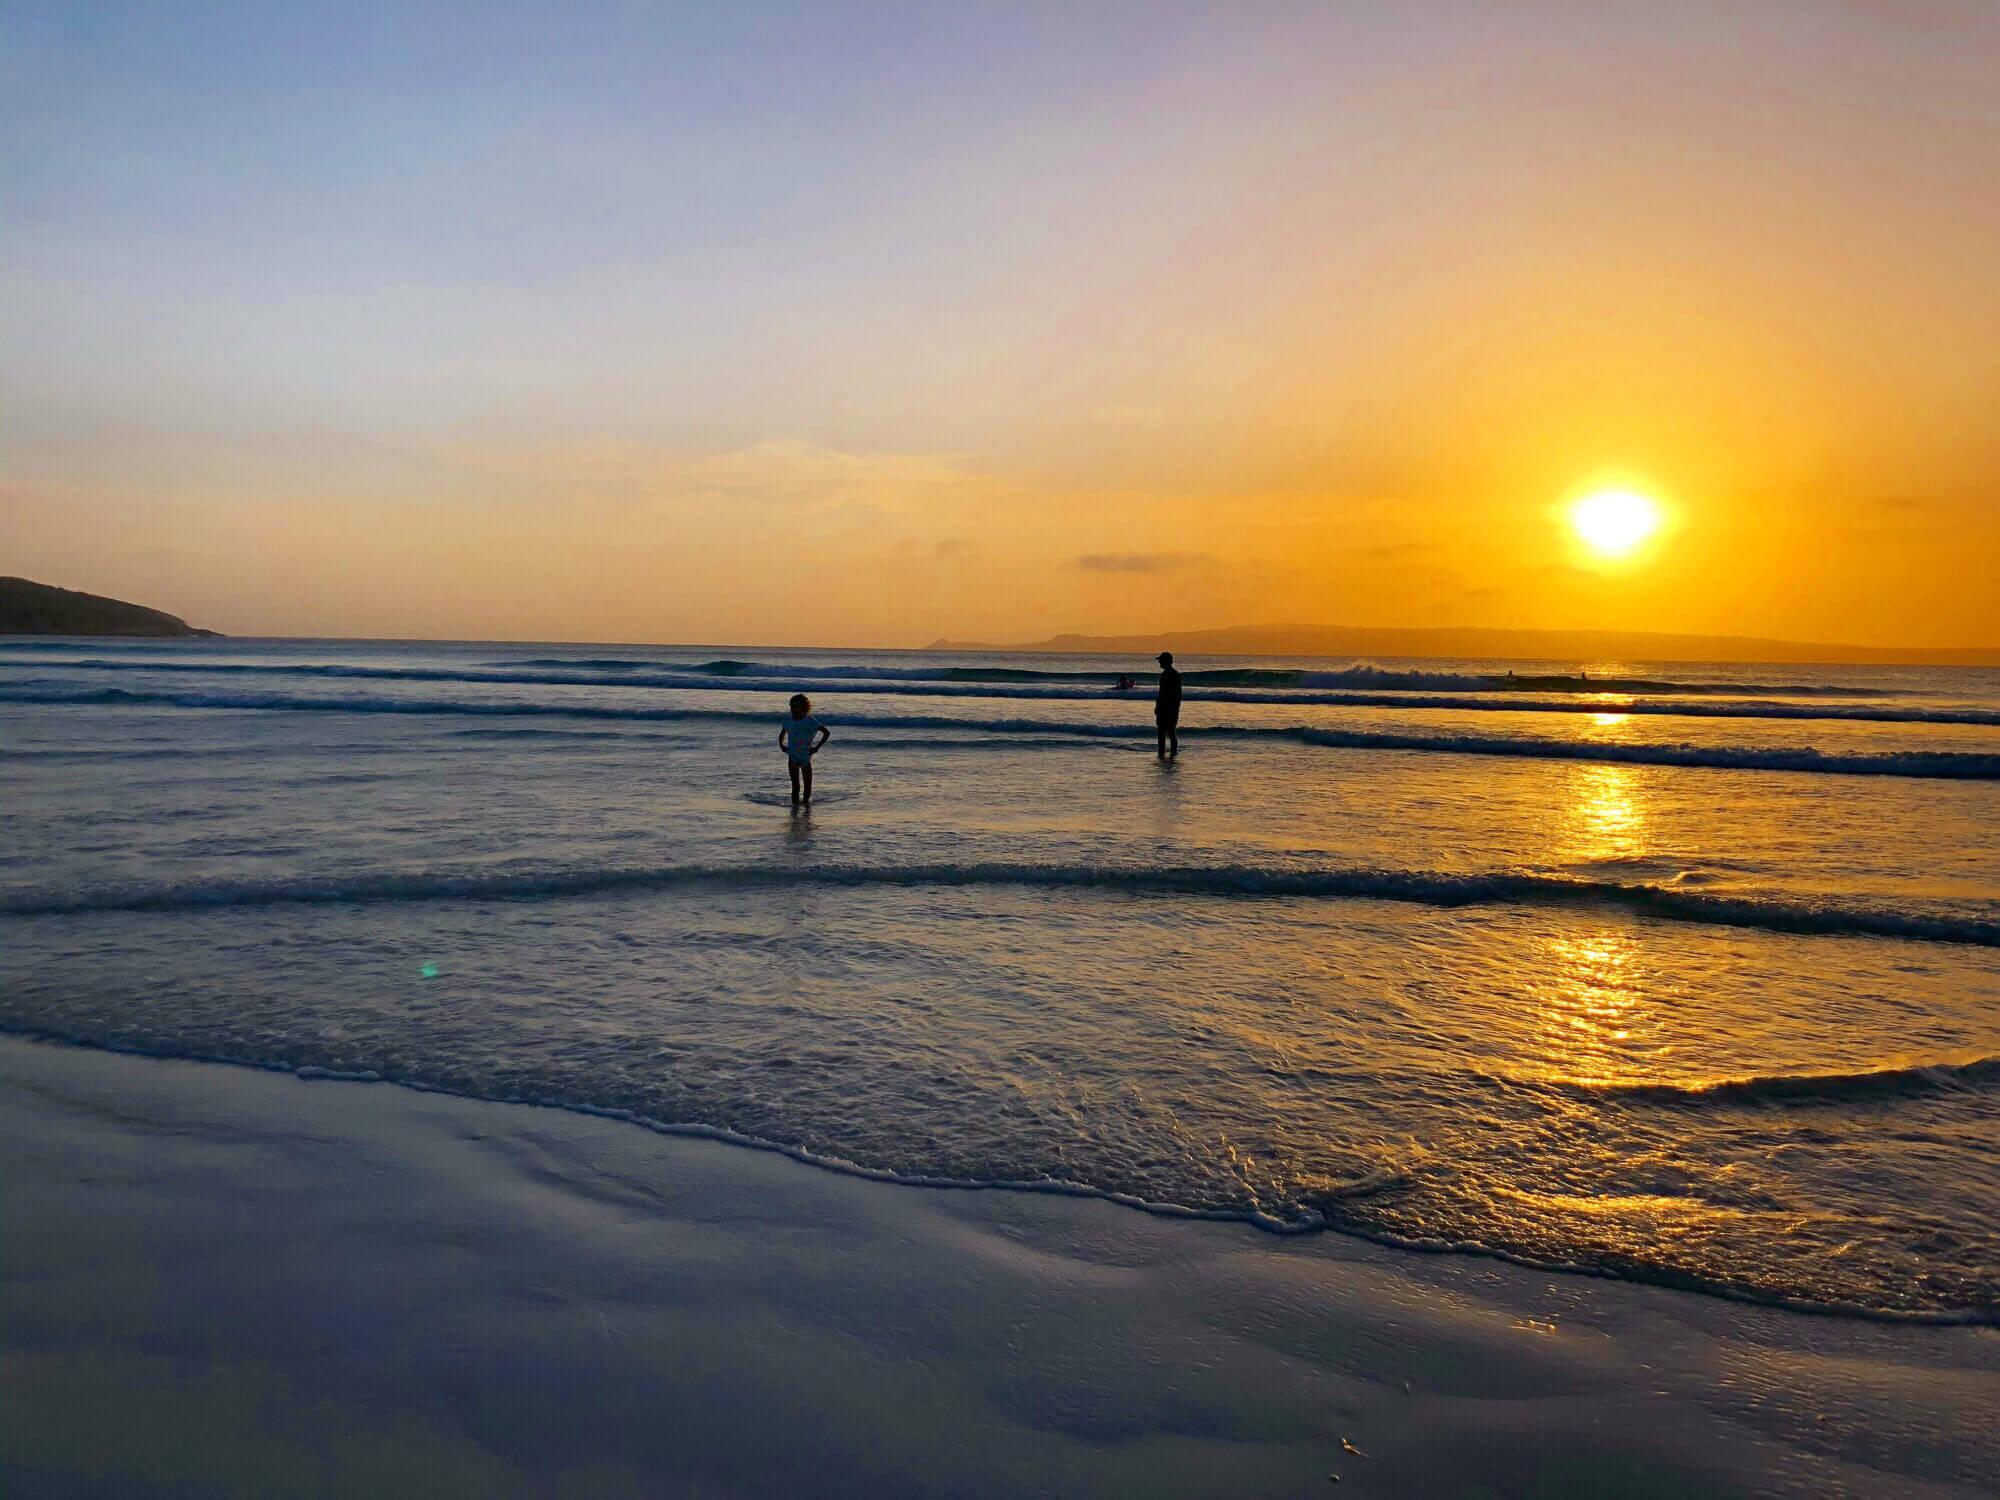 Sunset at Blossoms Beach, Bremer Bay